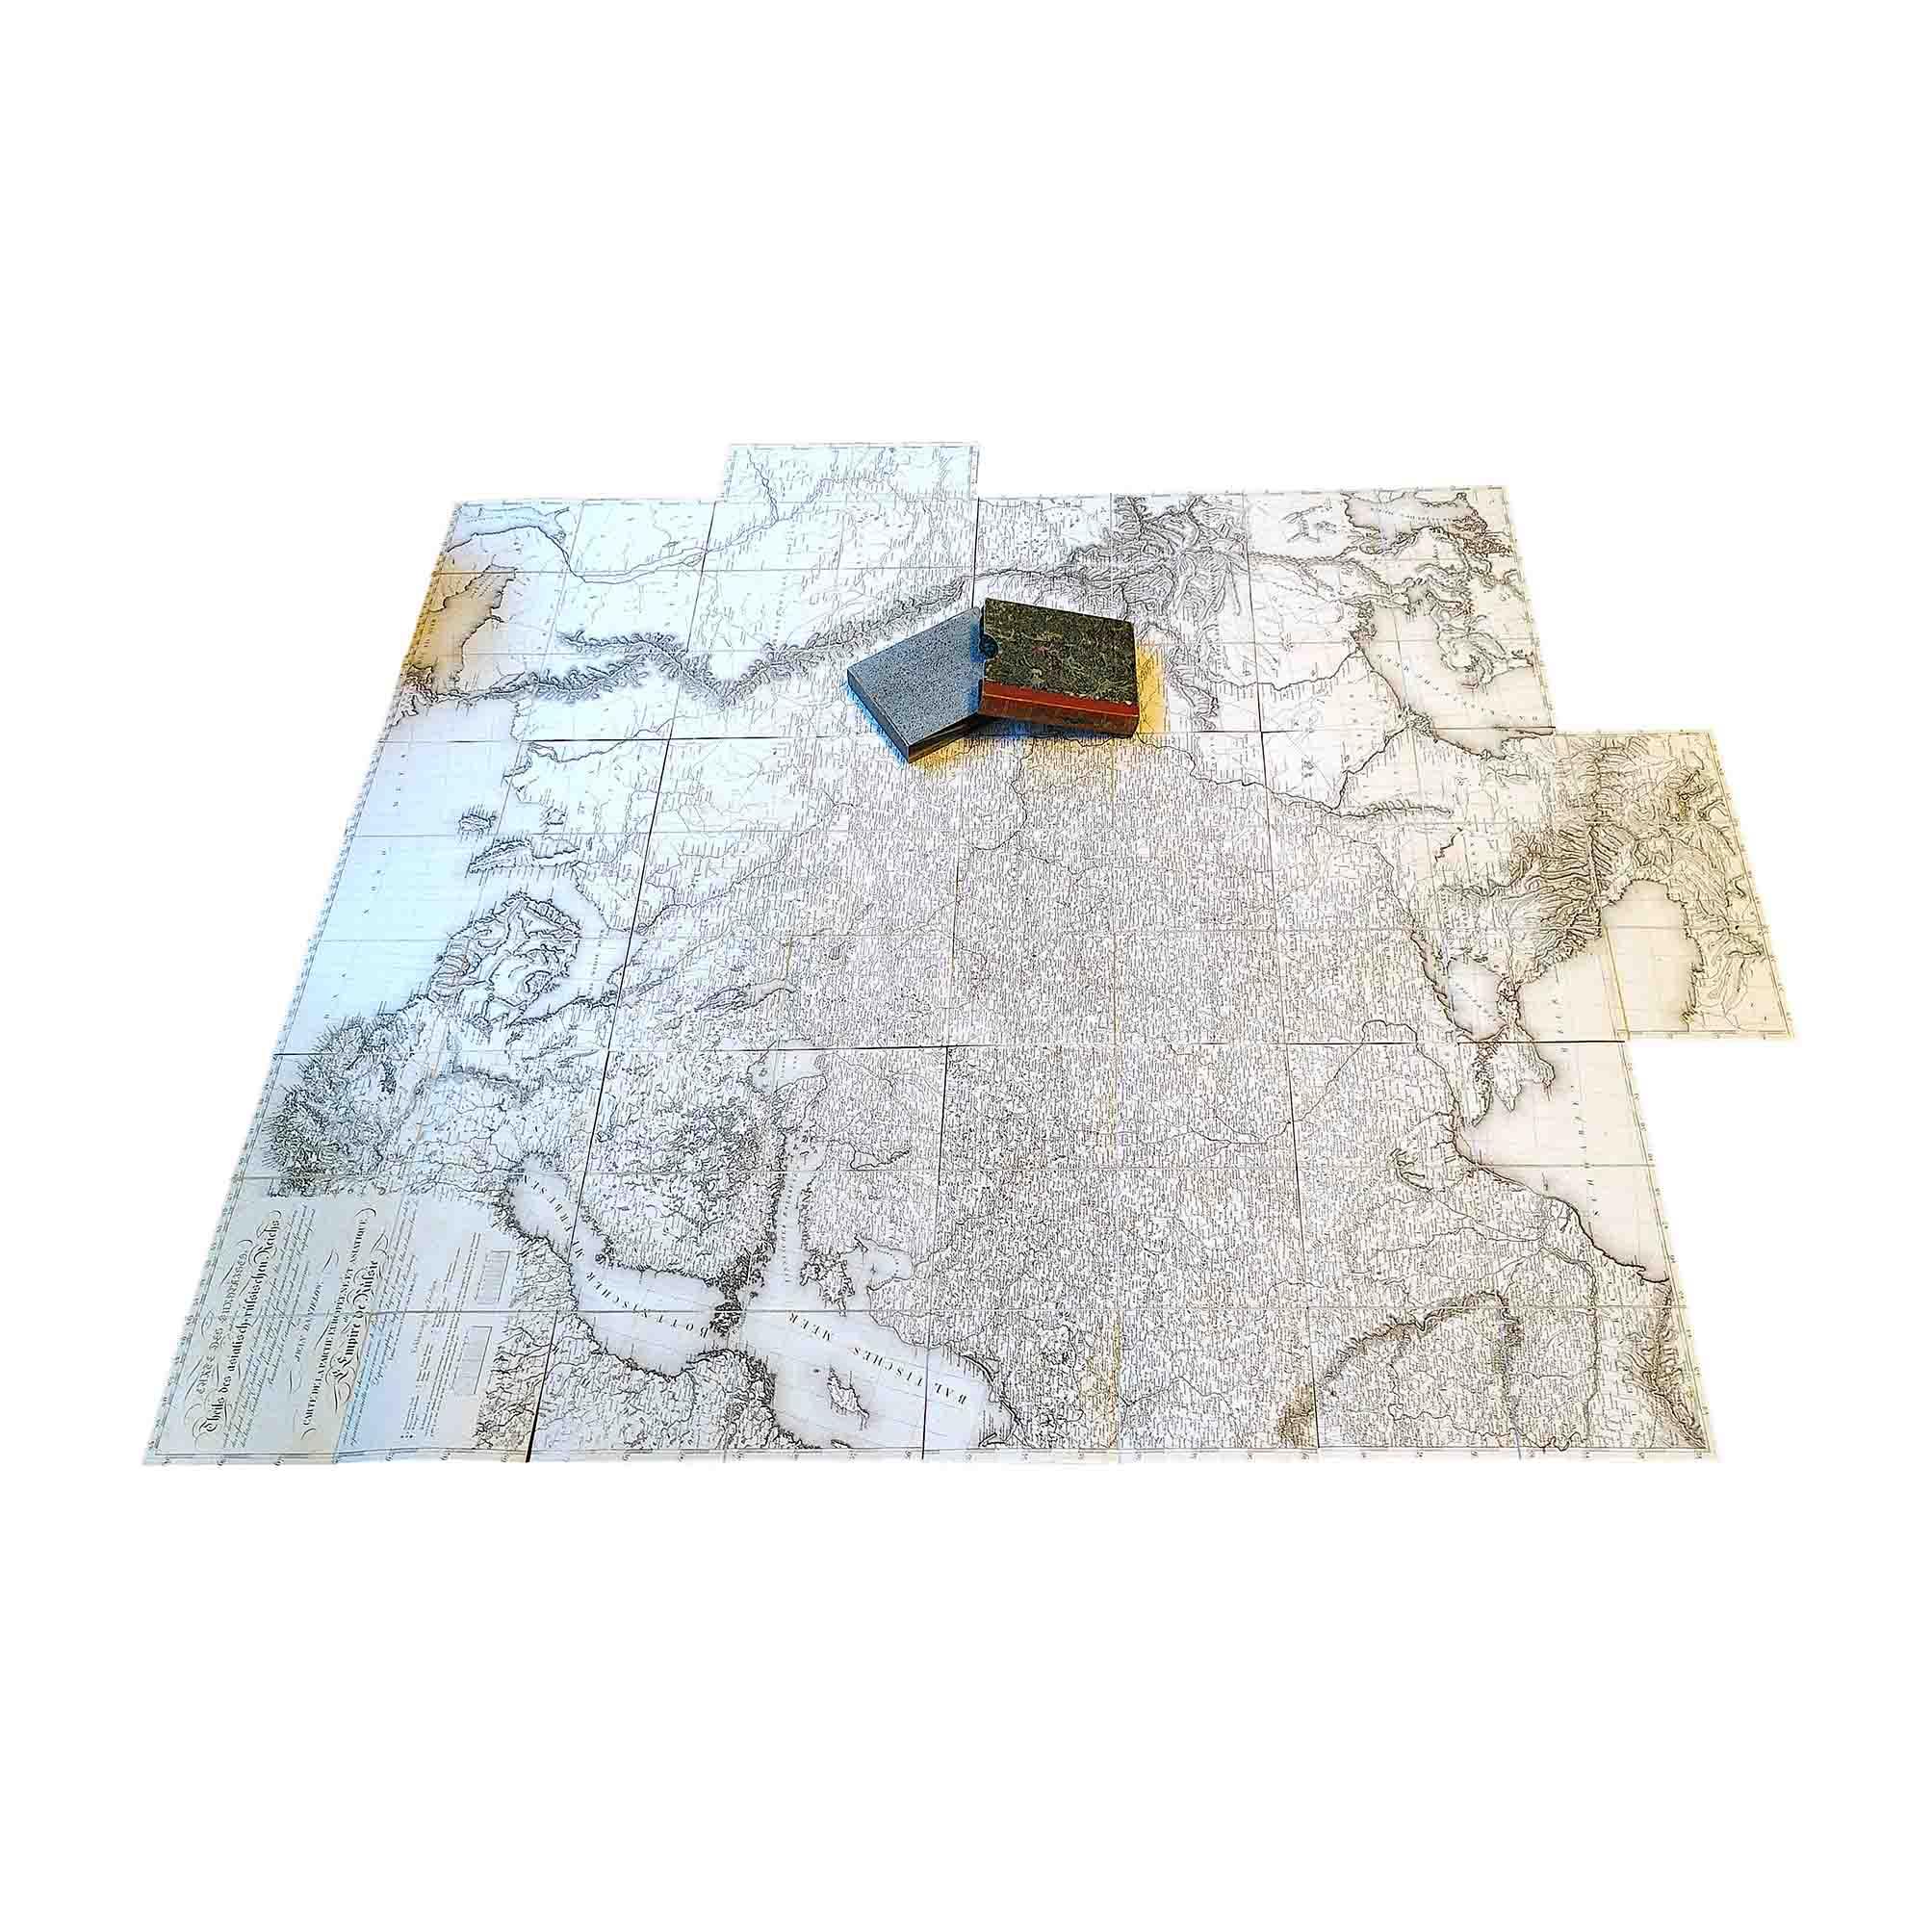 5989 Danielov Russia Map 1812 Open Complete free N